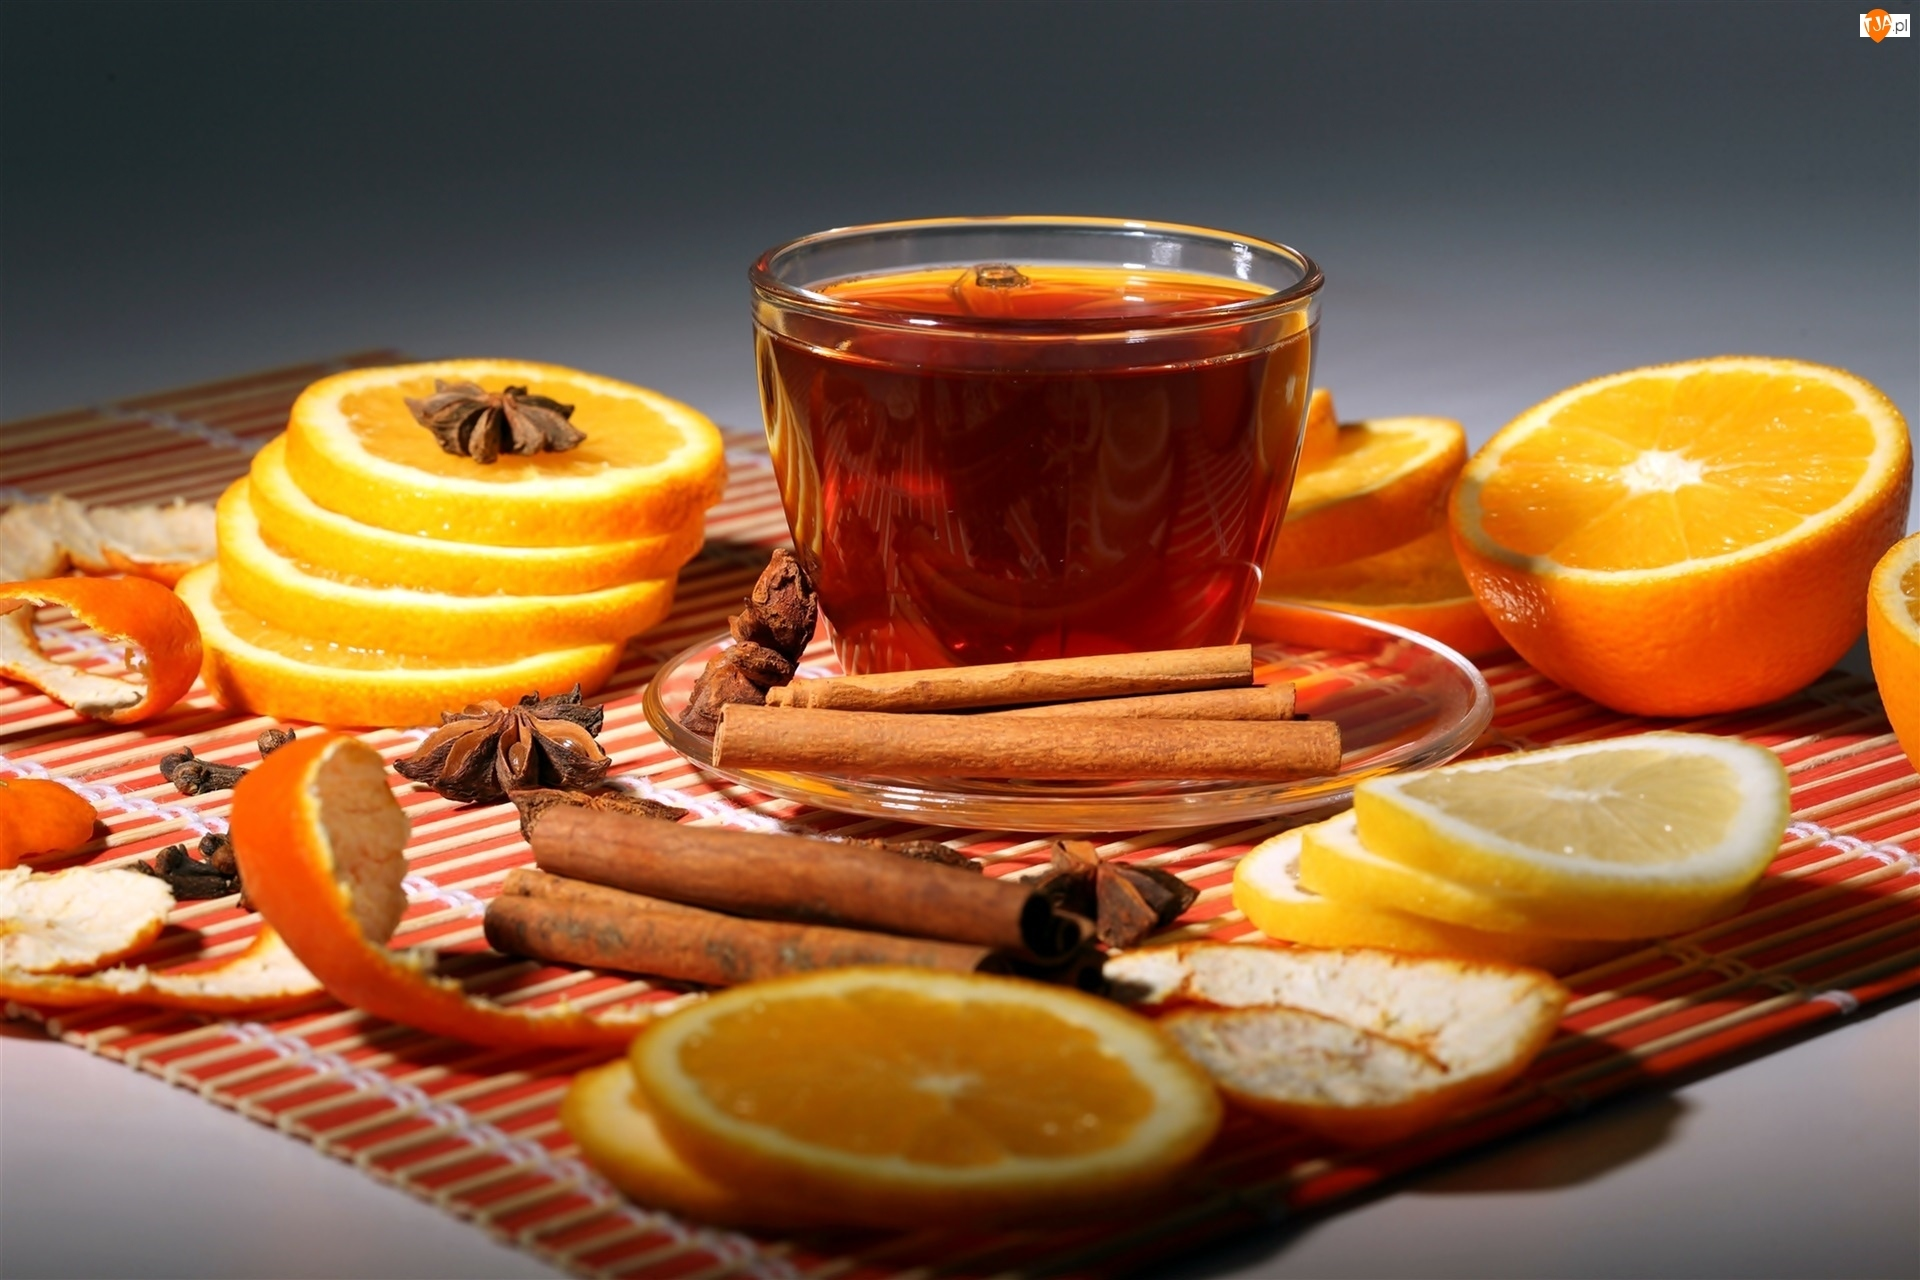 Herbaty, Filiżanka, Pomarańcza, Karambola, Cytryna, Cynamon